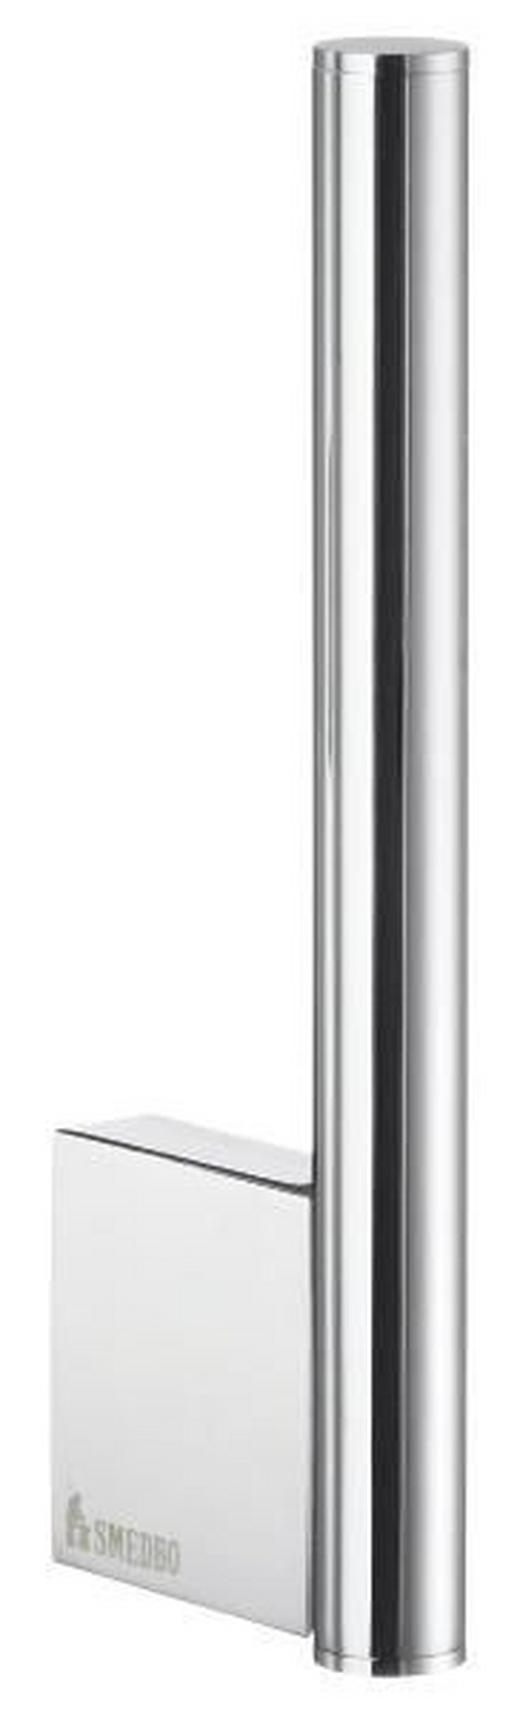 TOILETTENPAPIERHALTER - Chromfarben, Basics, Metall (1,5/17/5,6cm)